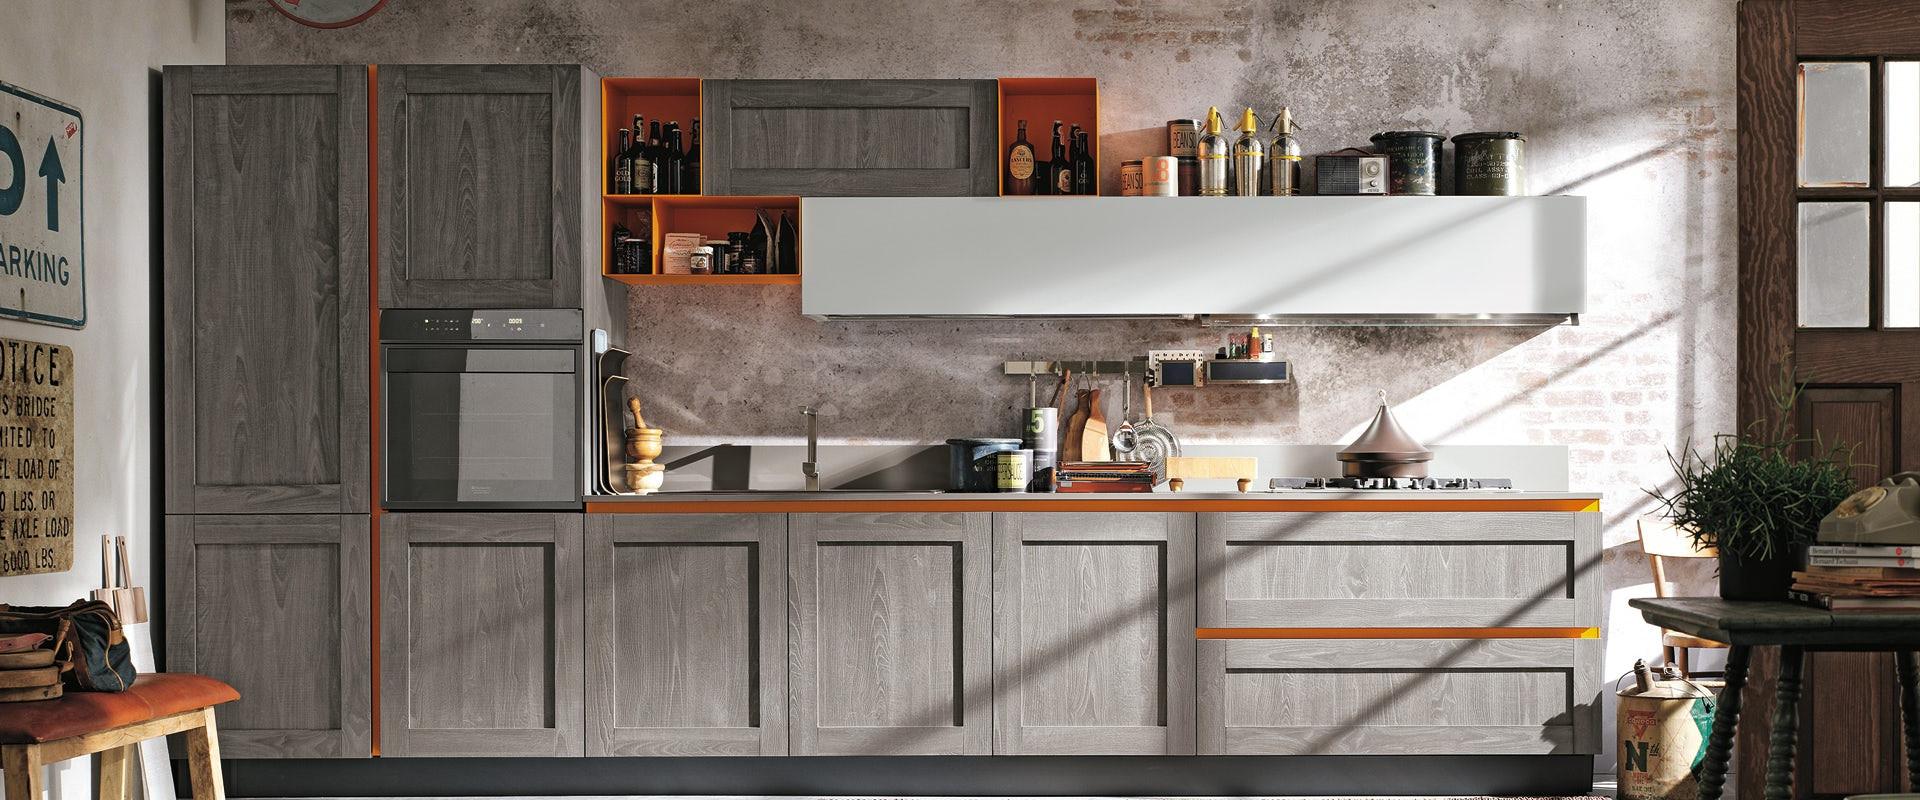 stosa-cucine-moderne-city-285.jpg